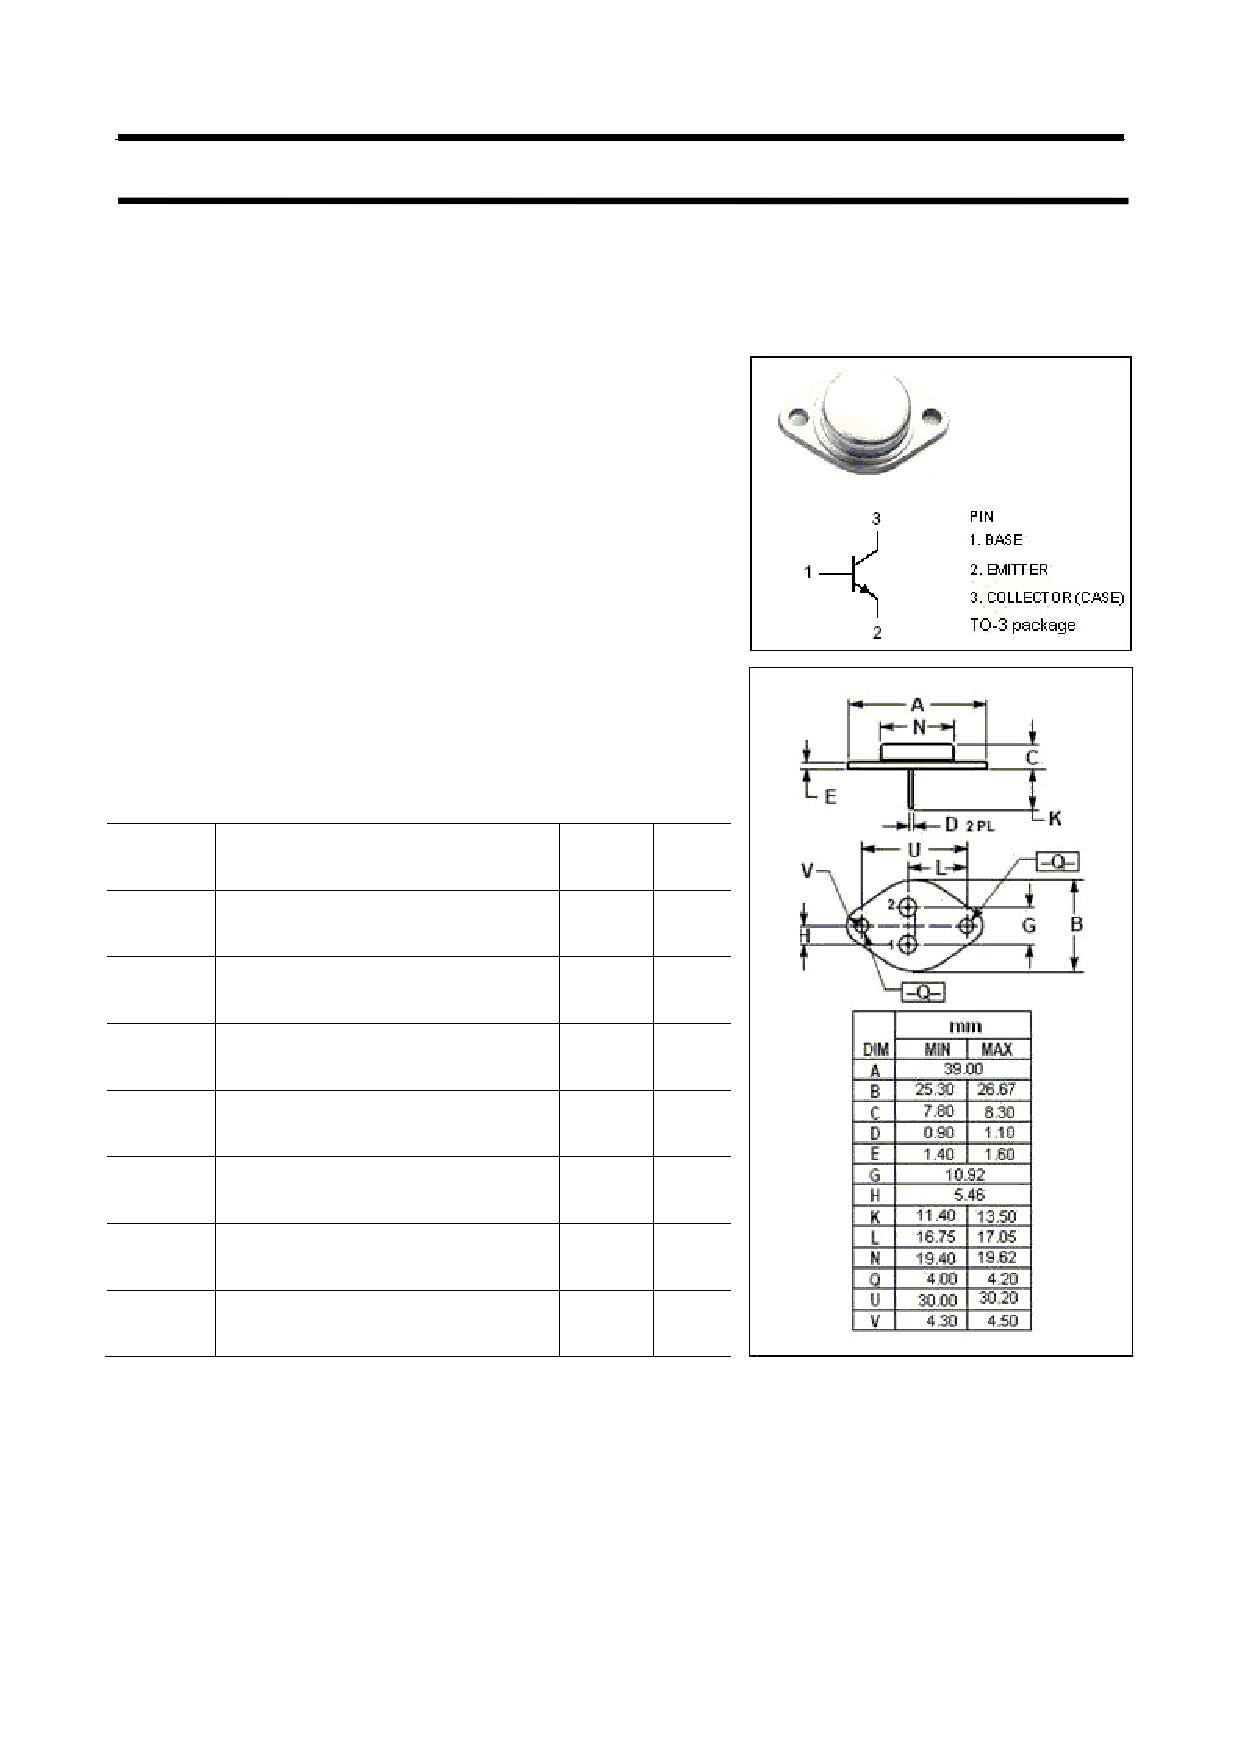 2N1470 datasheet